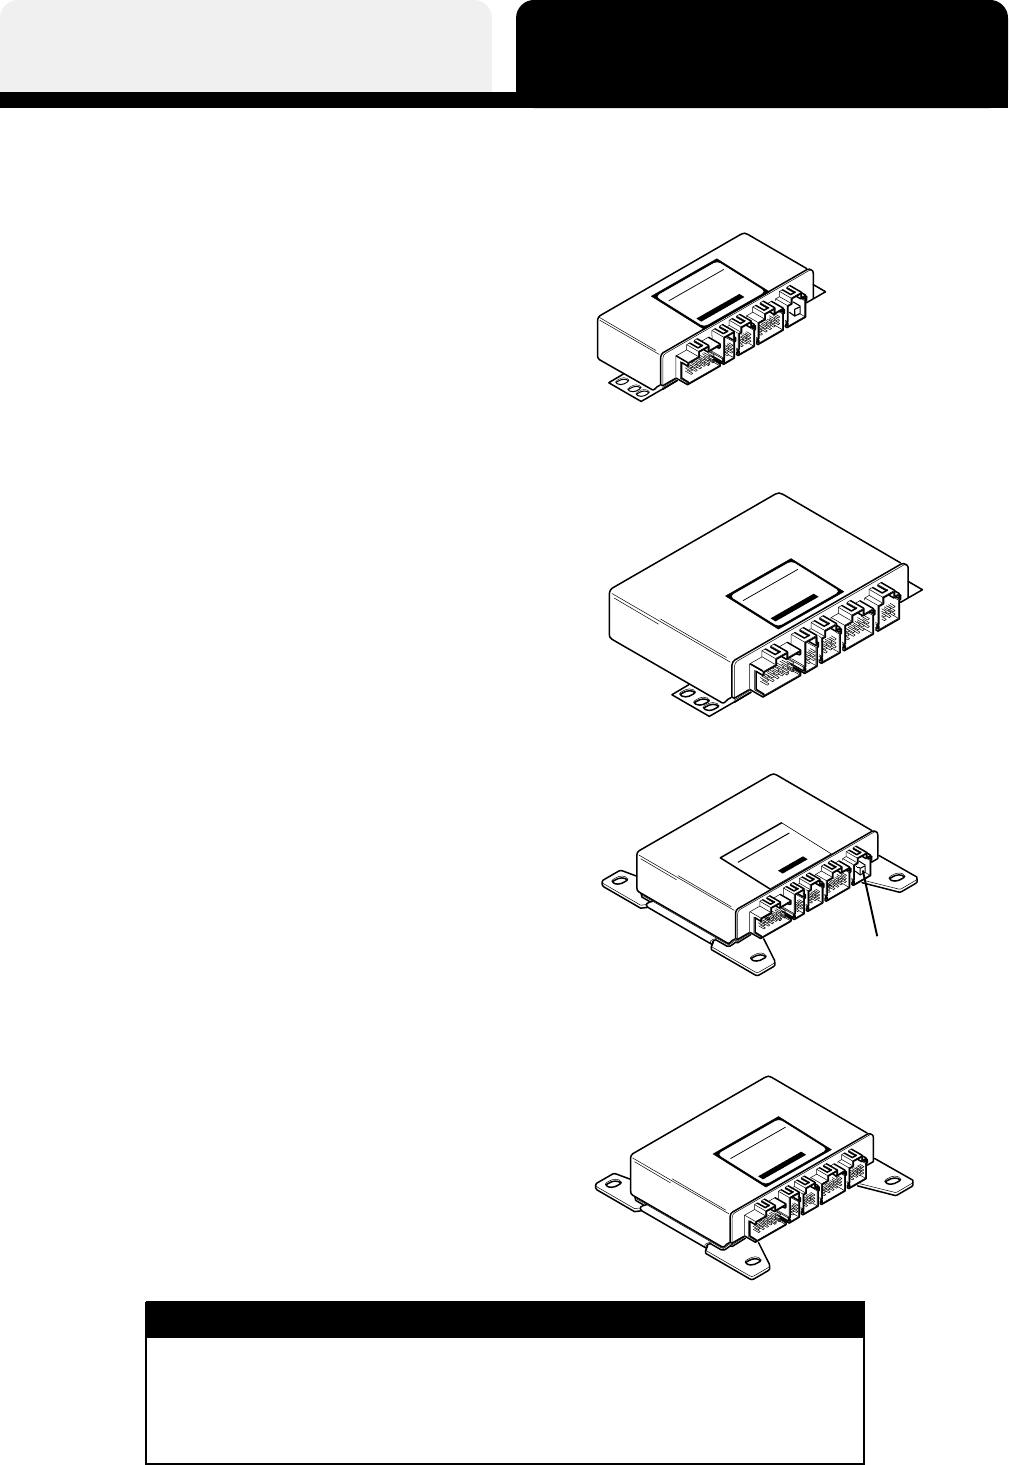 wiring diagram also 53 foot trailer diagram on semi trailer plug